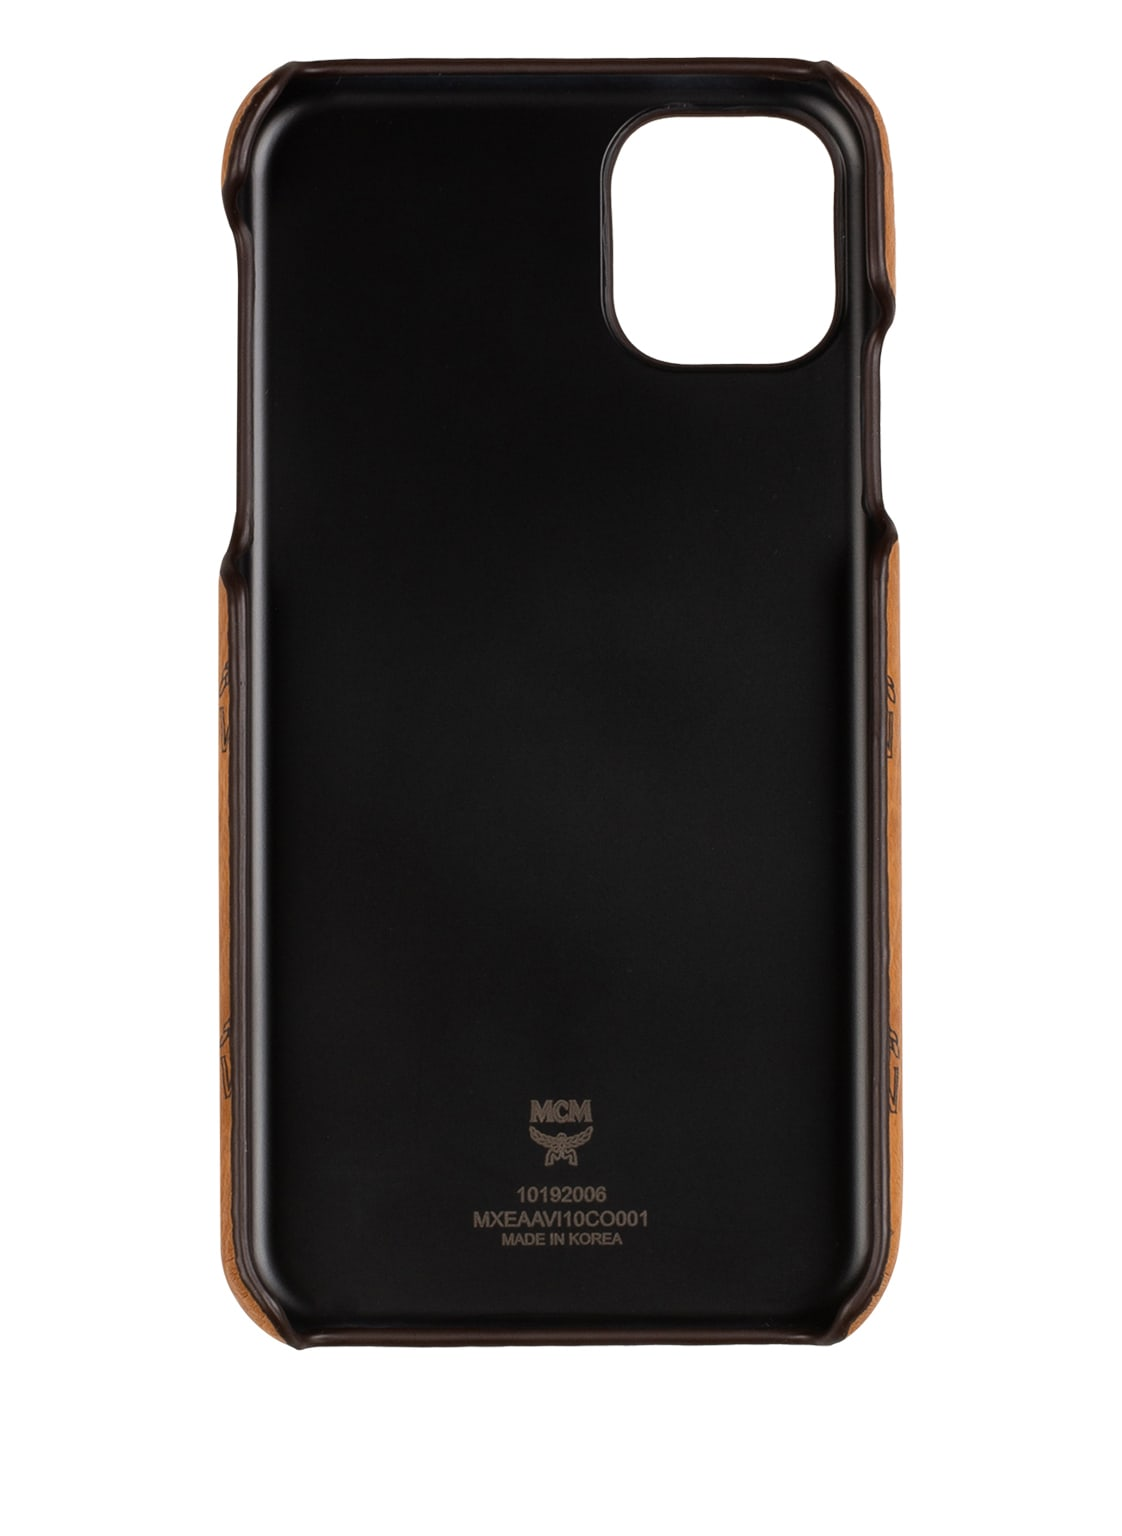 Accessoires Smartphone-Hülle von MCM